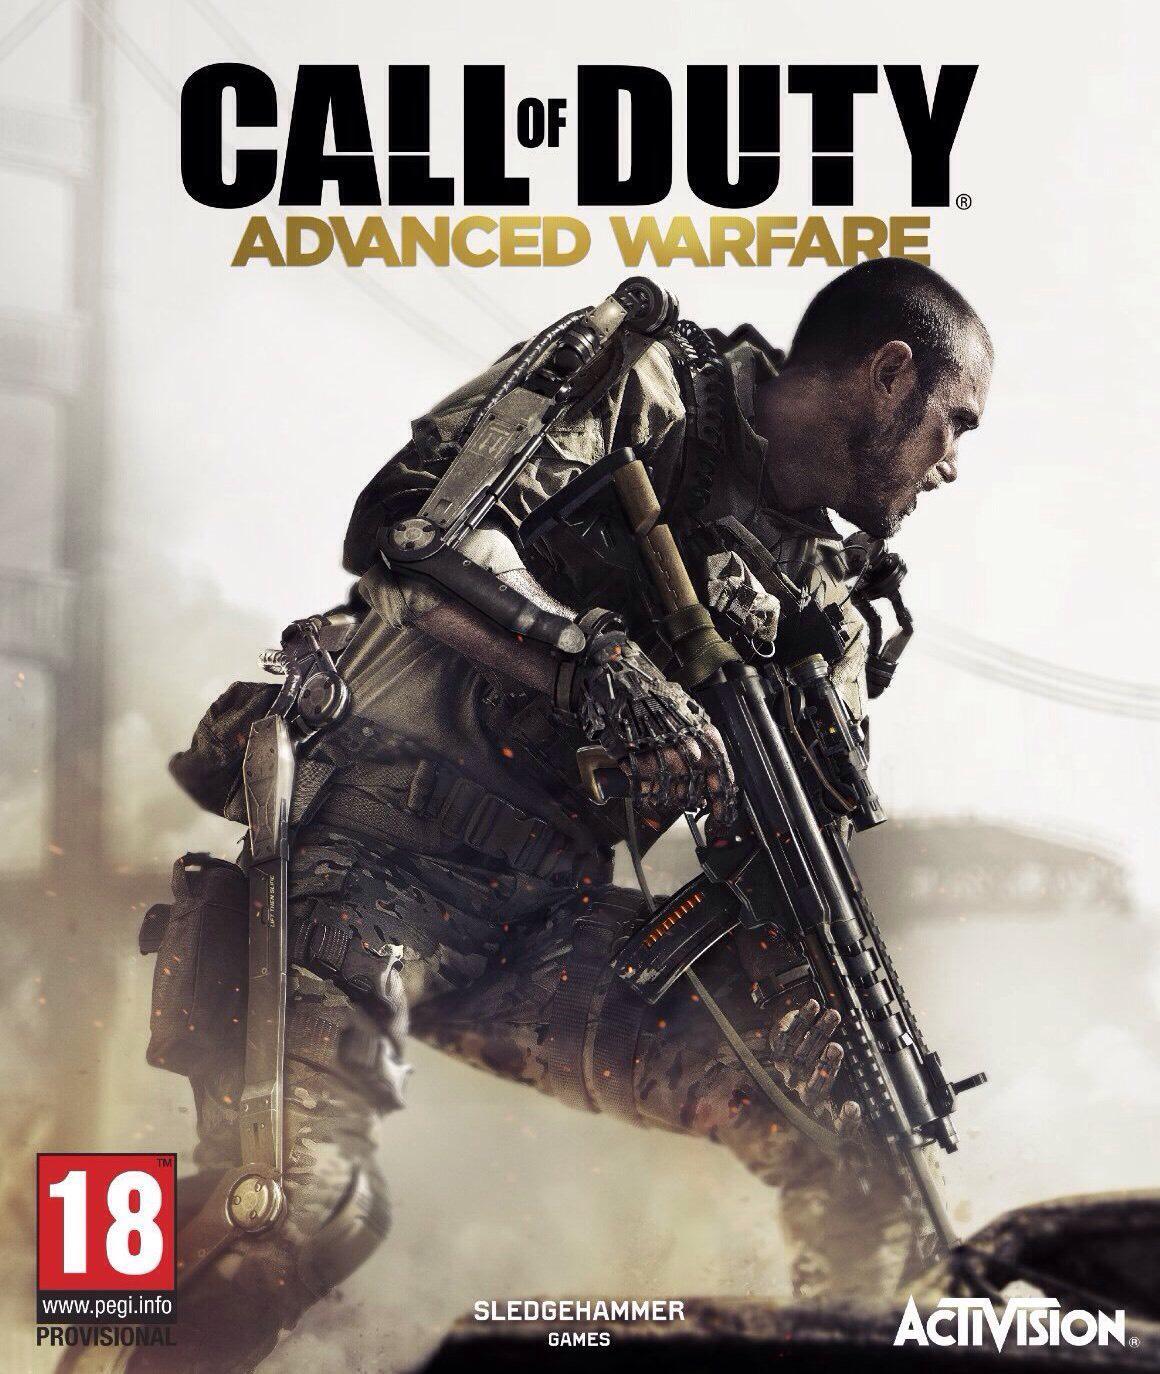 Call of duty : Advanced Warfare PC